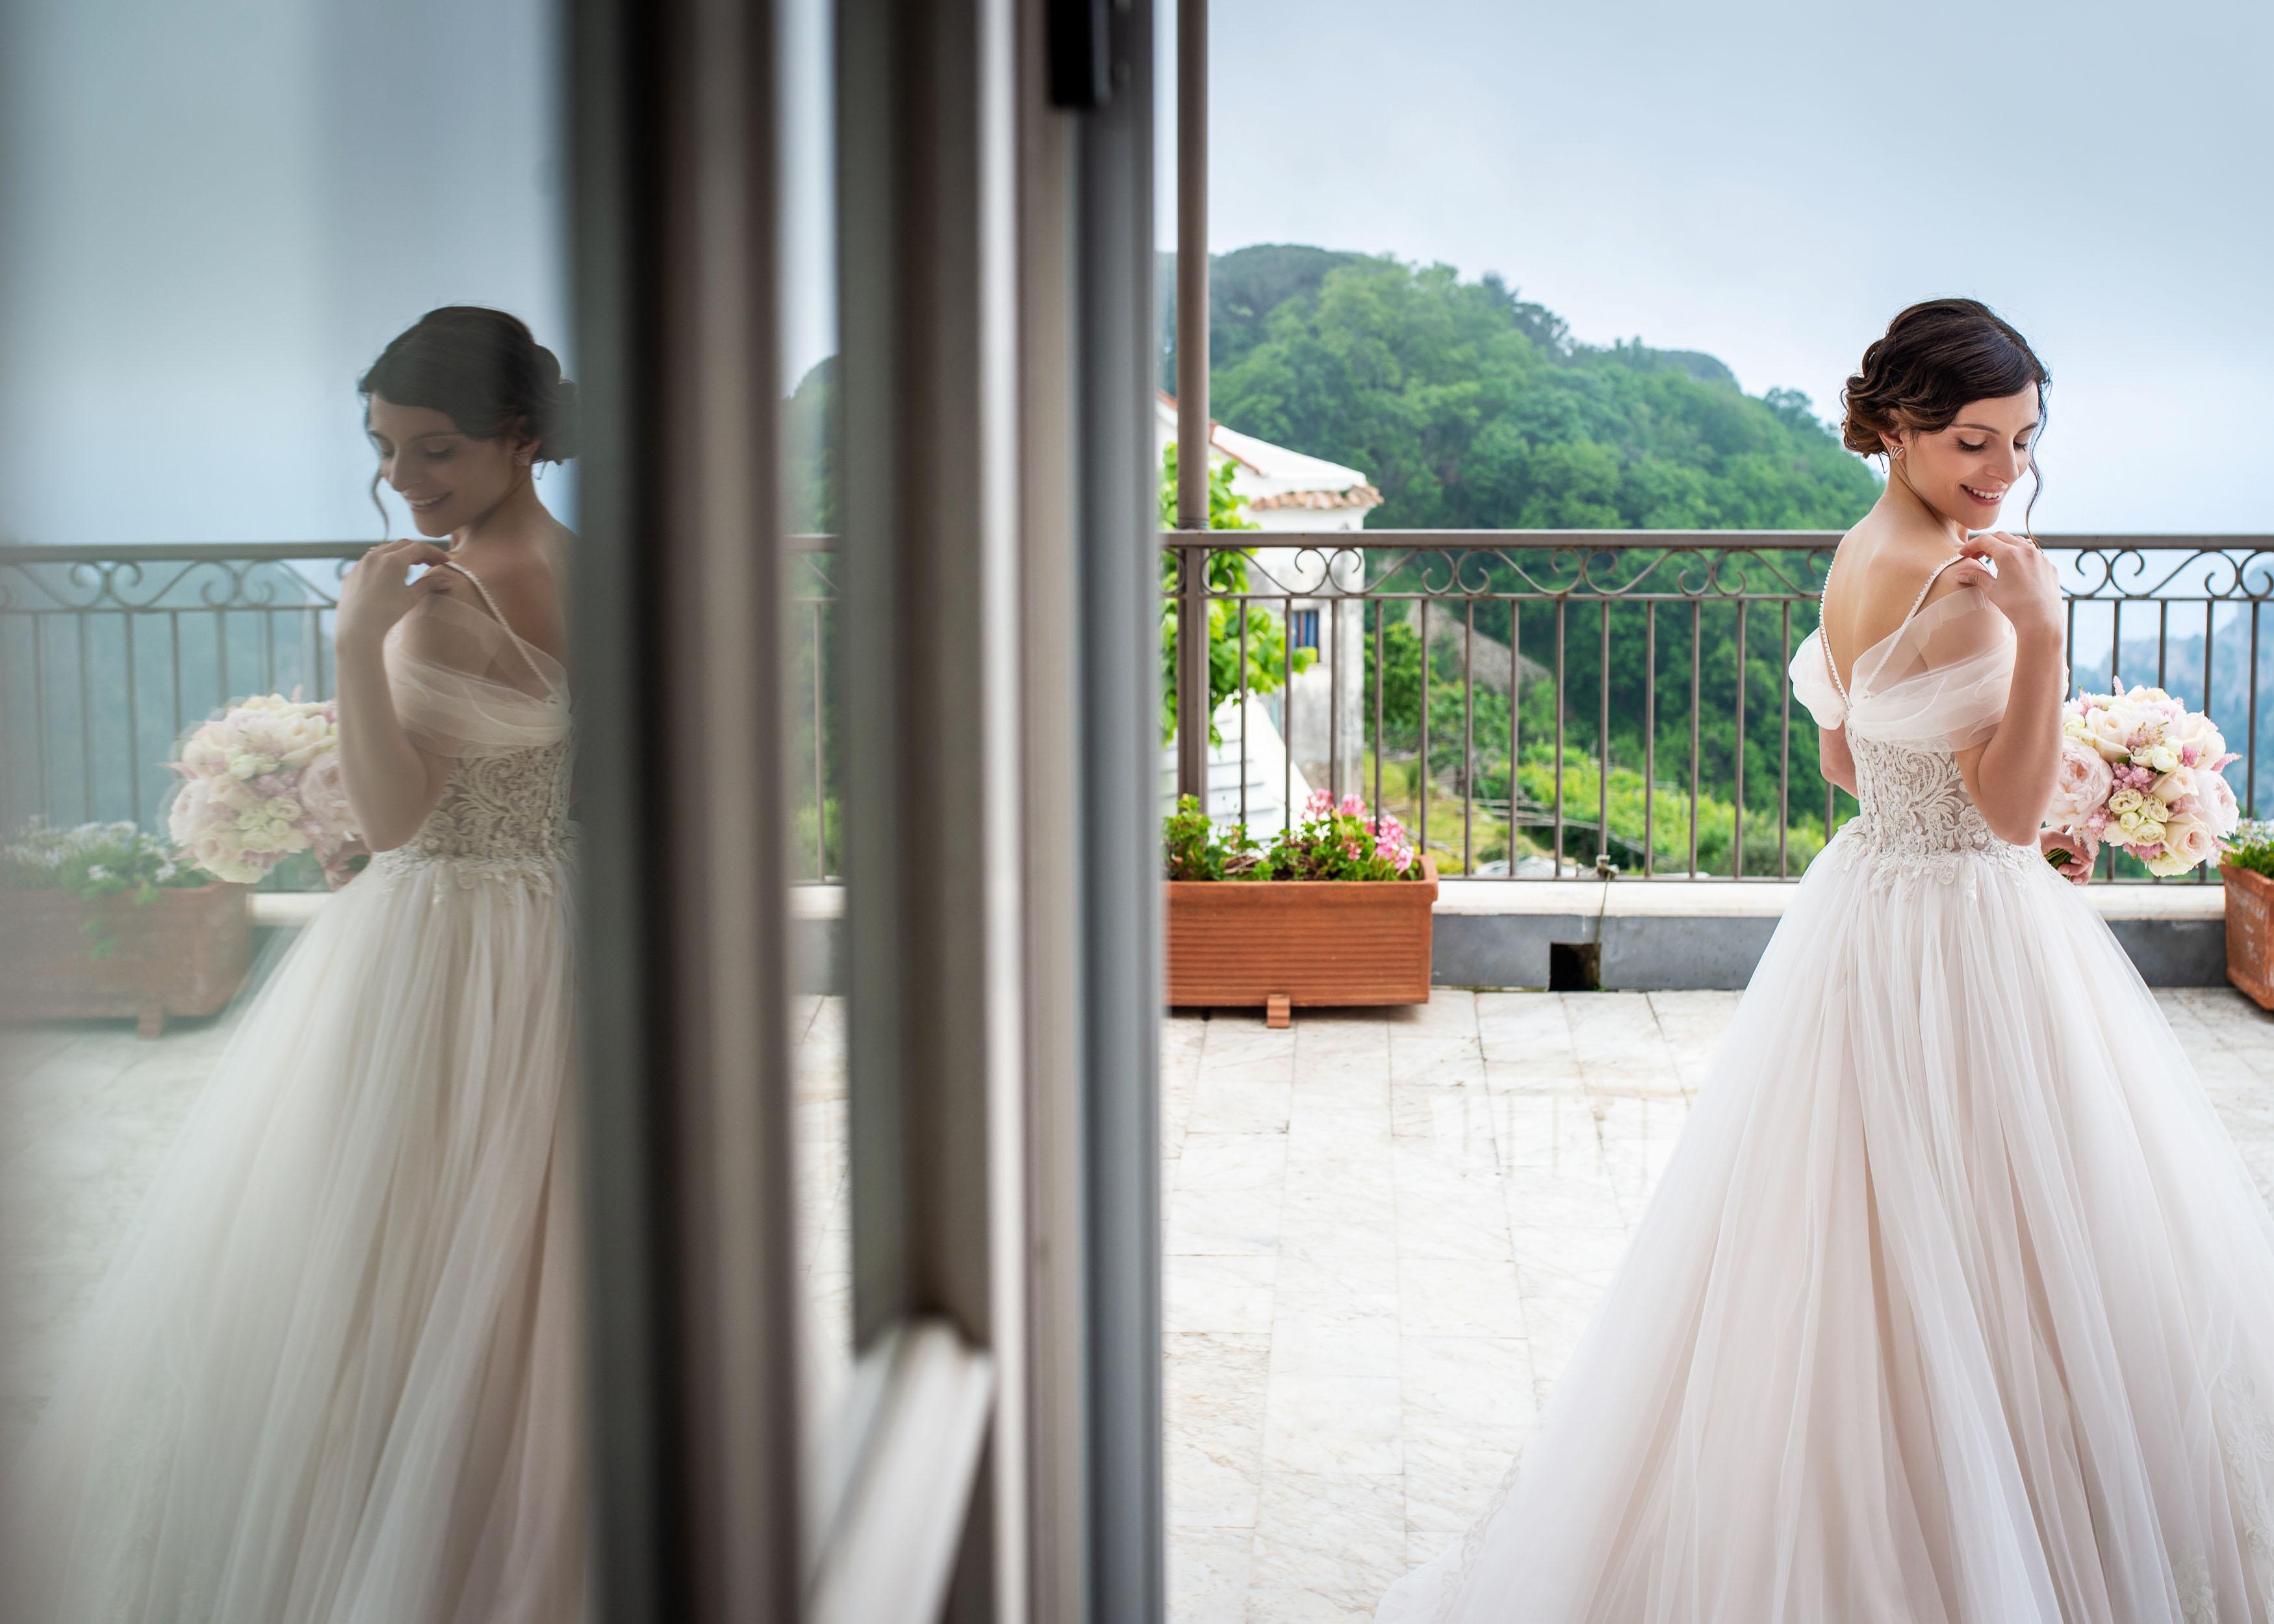 https://www.weddingamalfi.com/wp-content/uploads/Katia-Jorge-18-maggio-2019-18.jpg